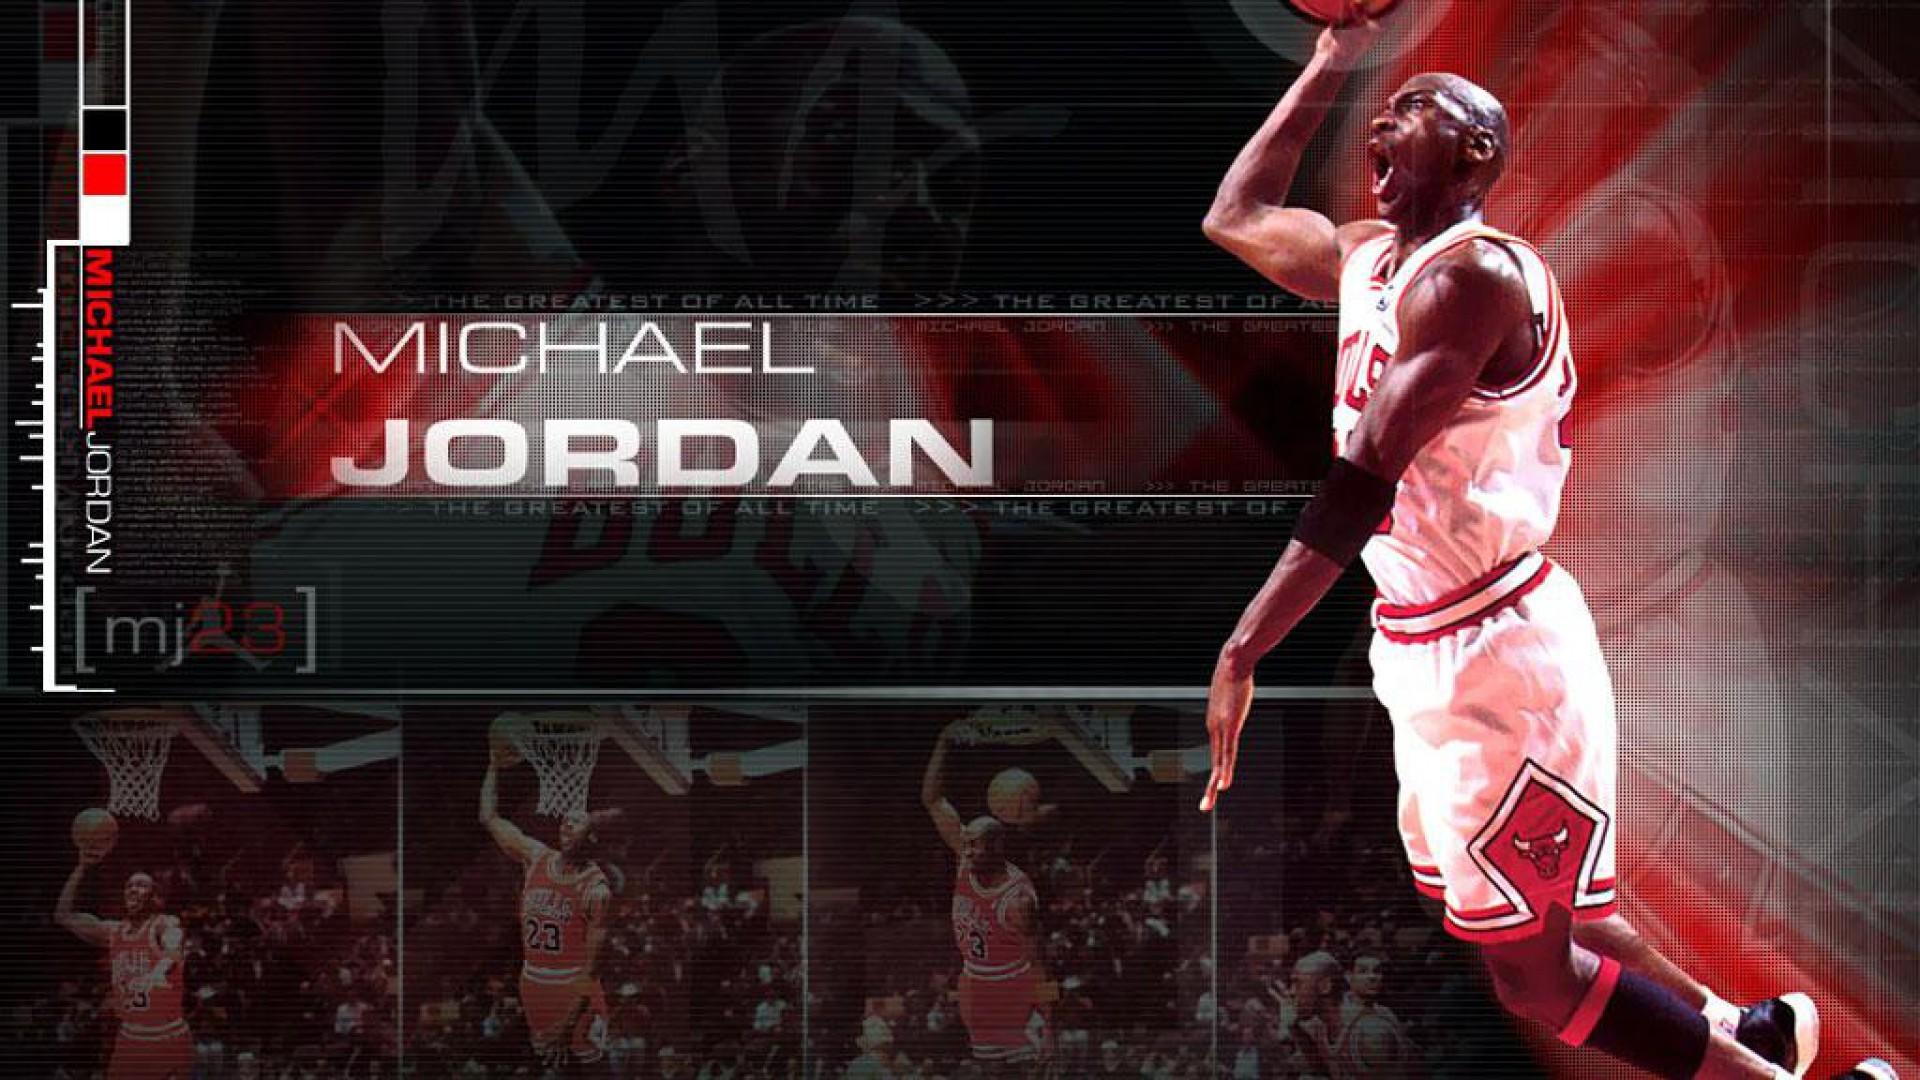 Michael Jordan HD Wallpapers Backgrounds Wallpaper 1024×768 Michael Jordan  Wallpapers 1080p (53 Wallpapers